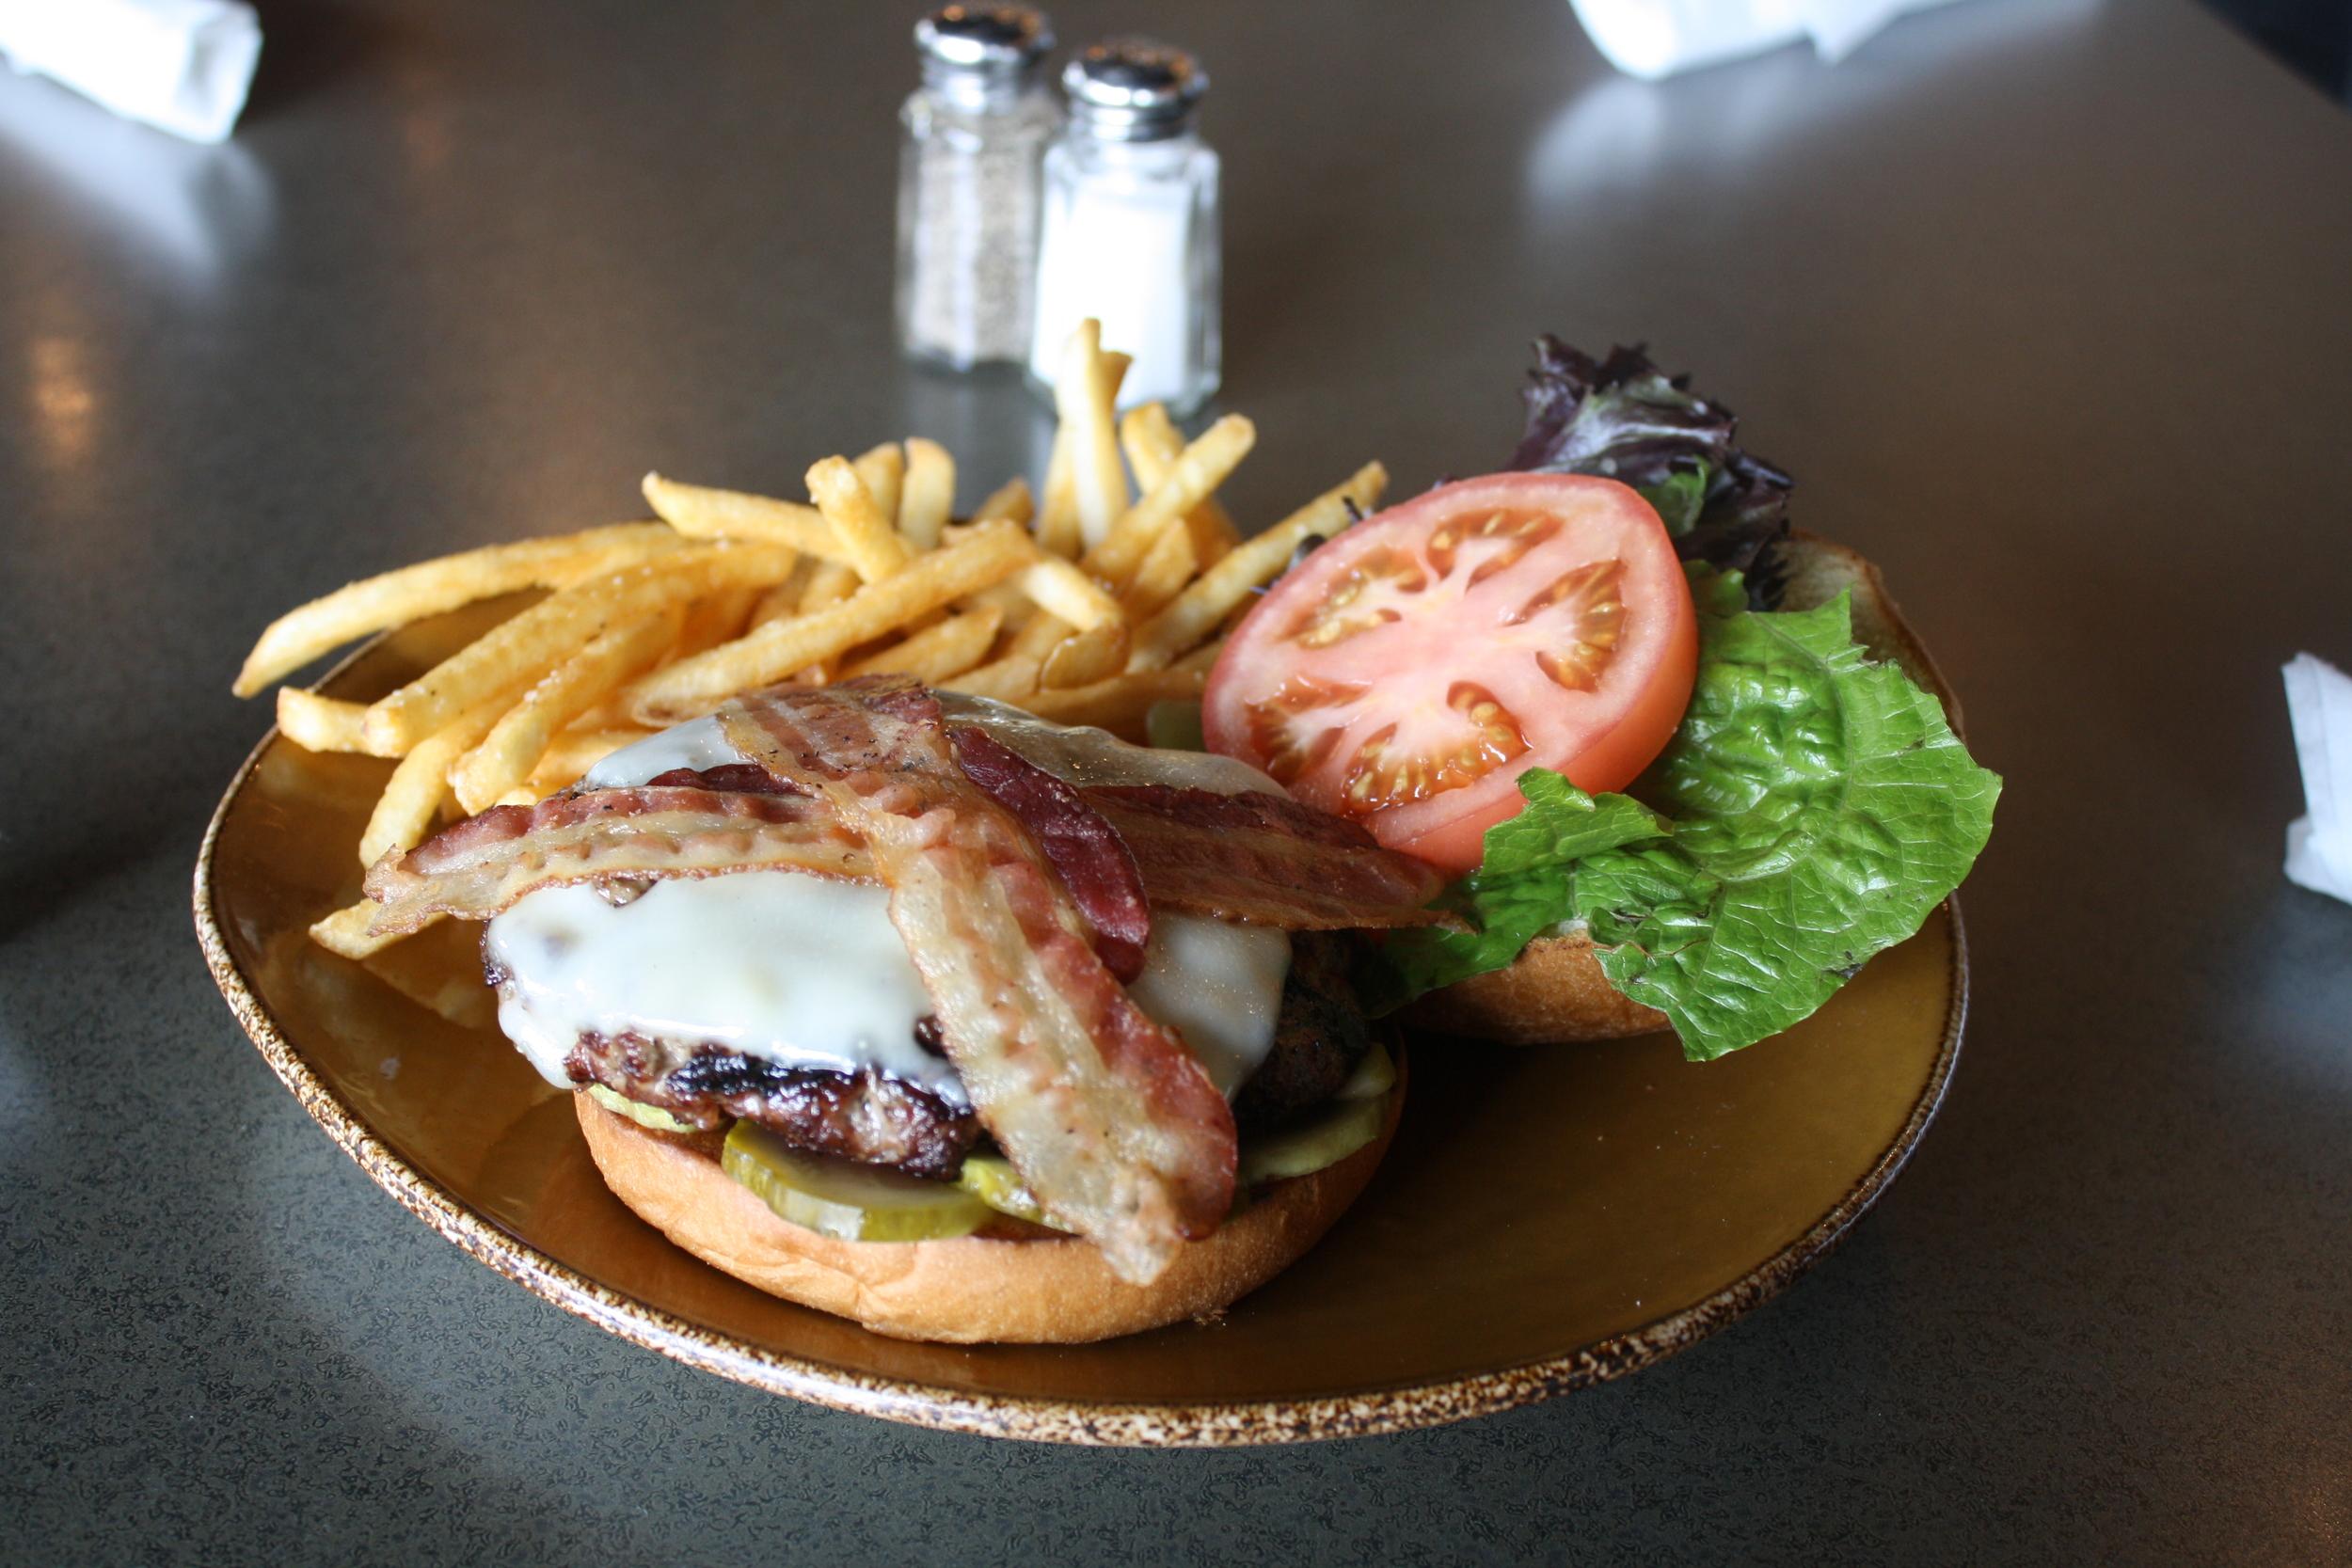 LYNX GC Burger Thursday Grill Lunch Dinner